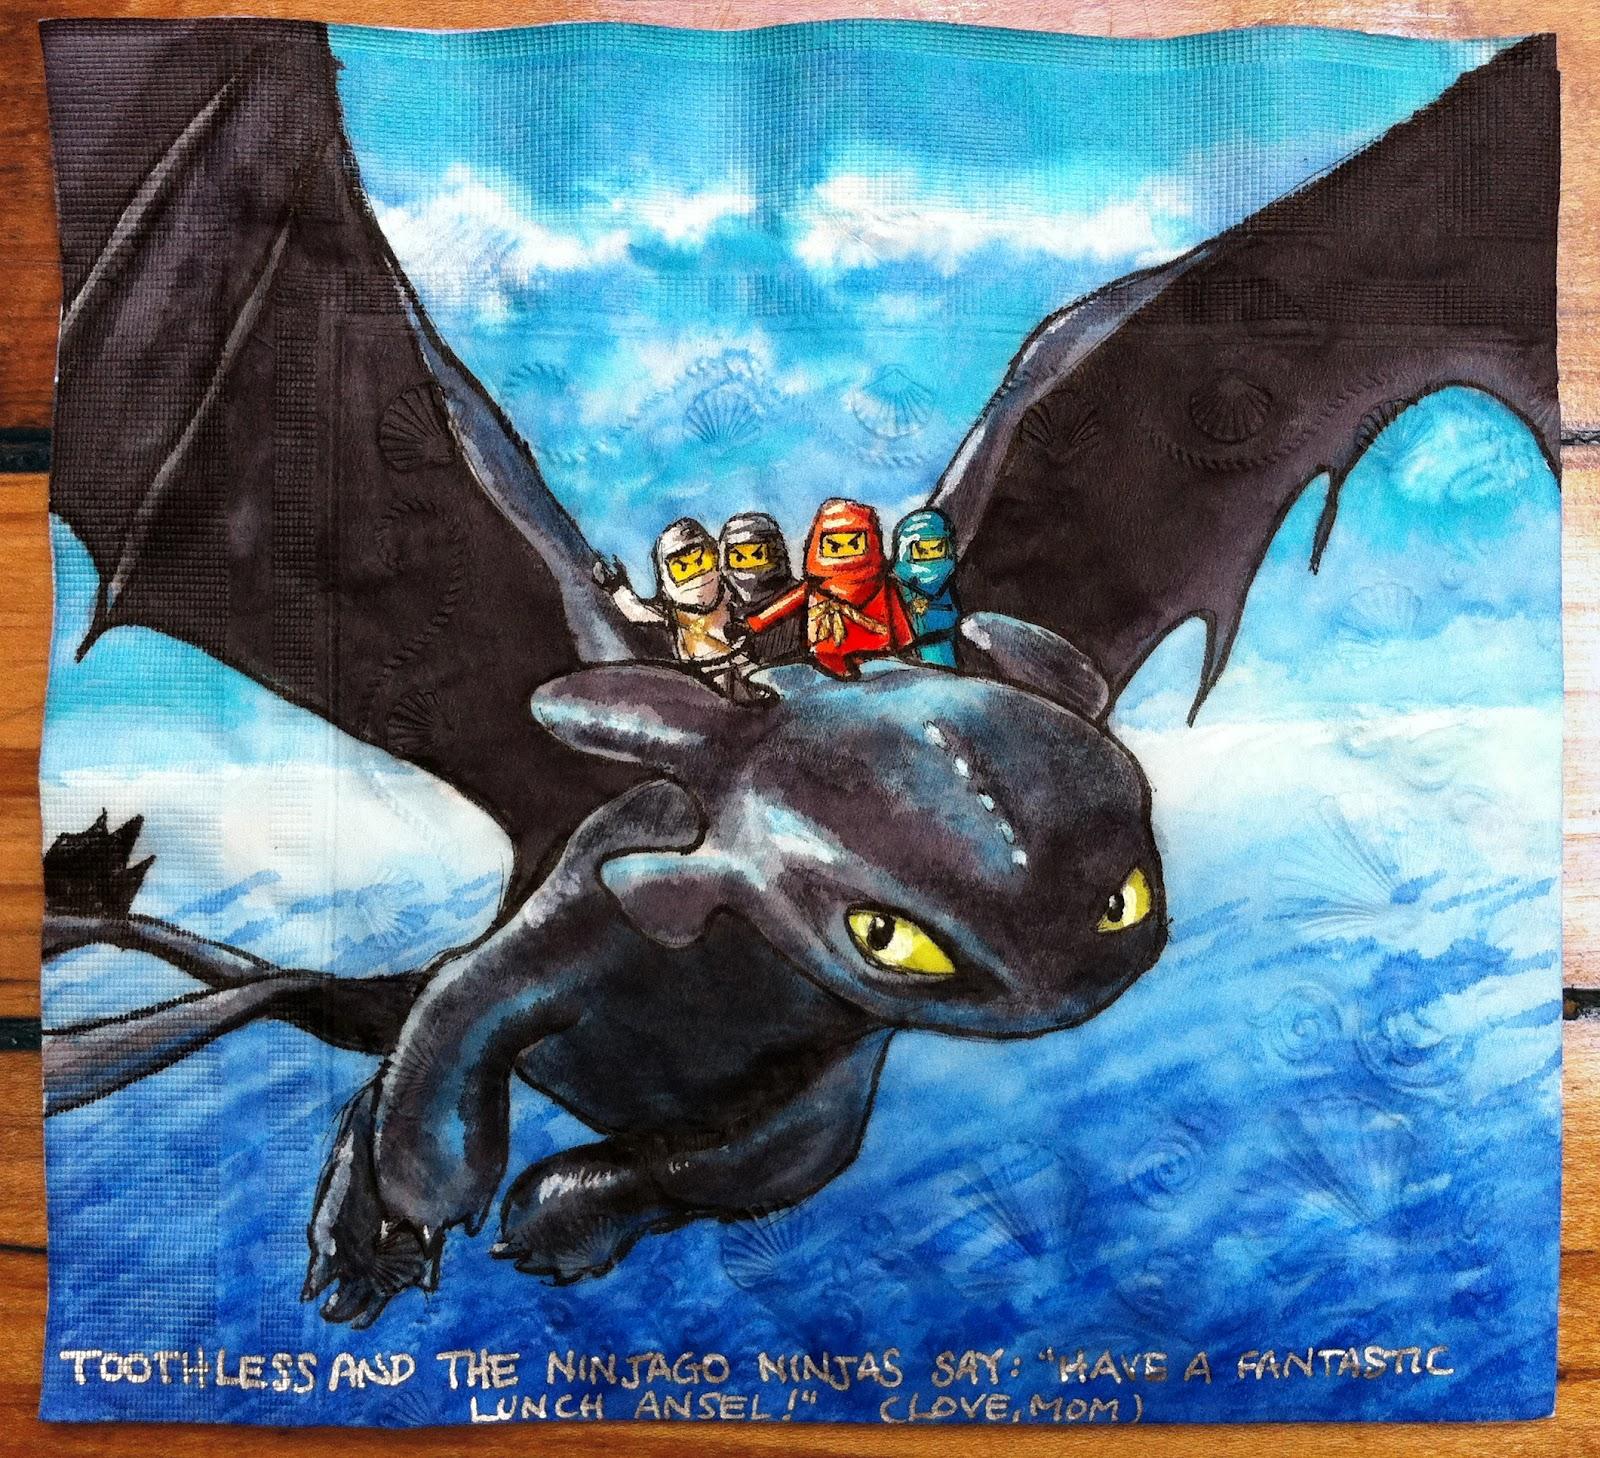 Daily Napkins Toothless And Lego Ninjago Ninjas For Ansel